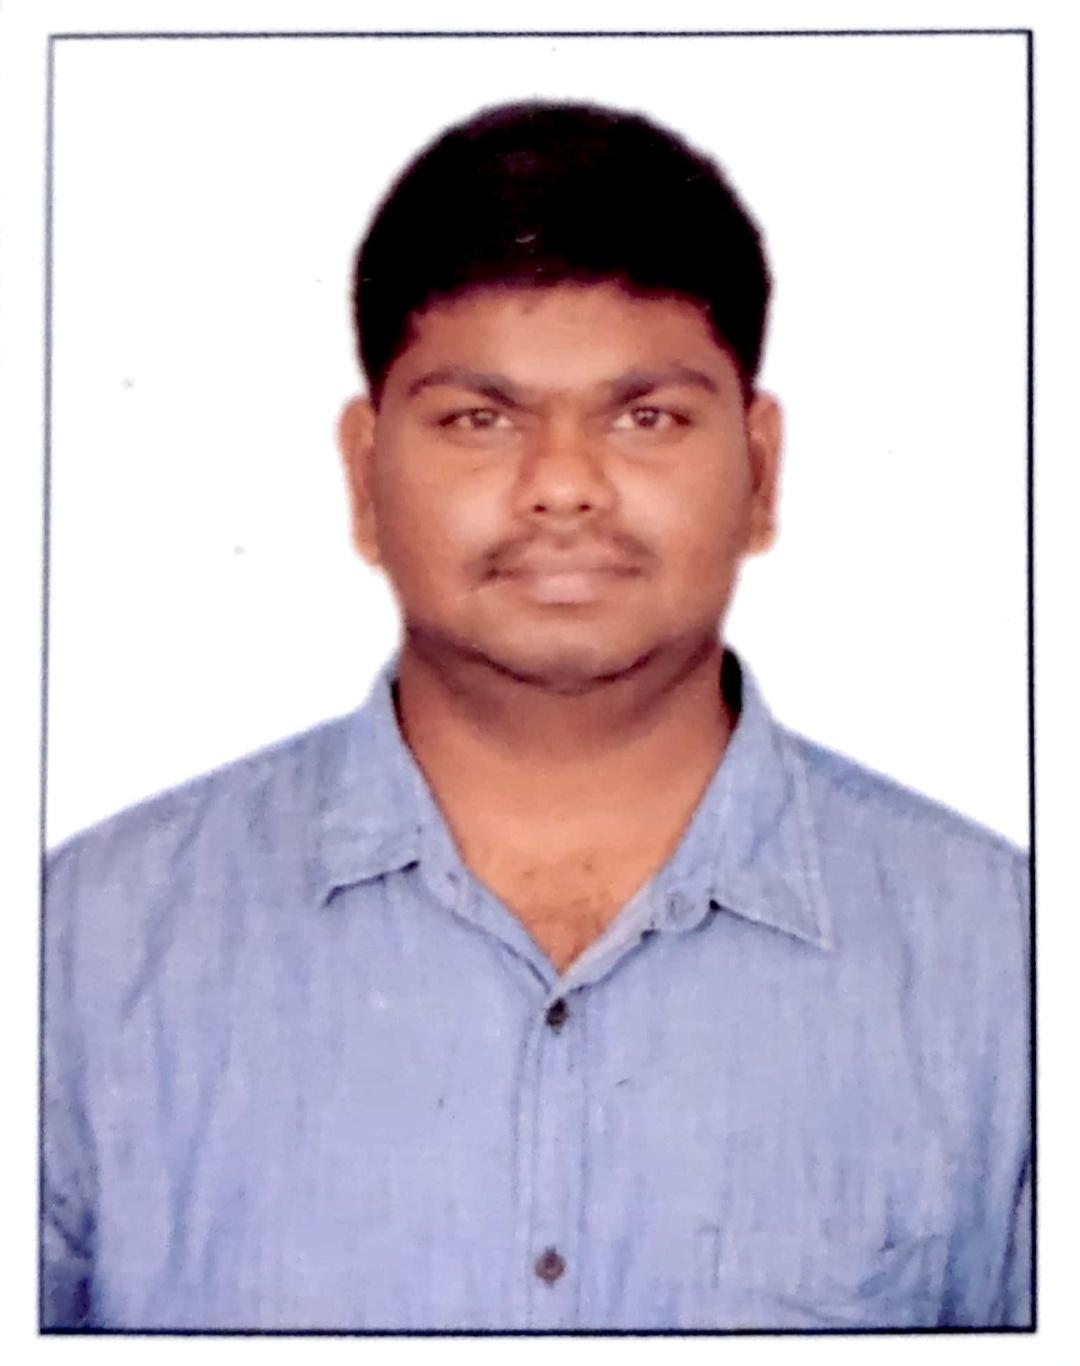 Cherukuri Manoj